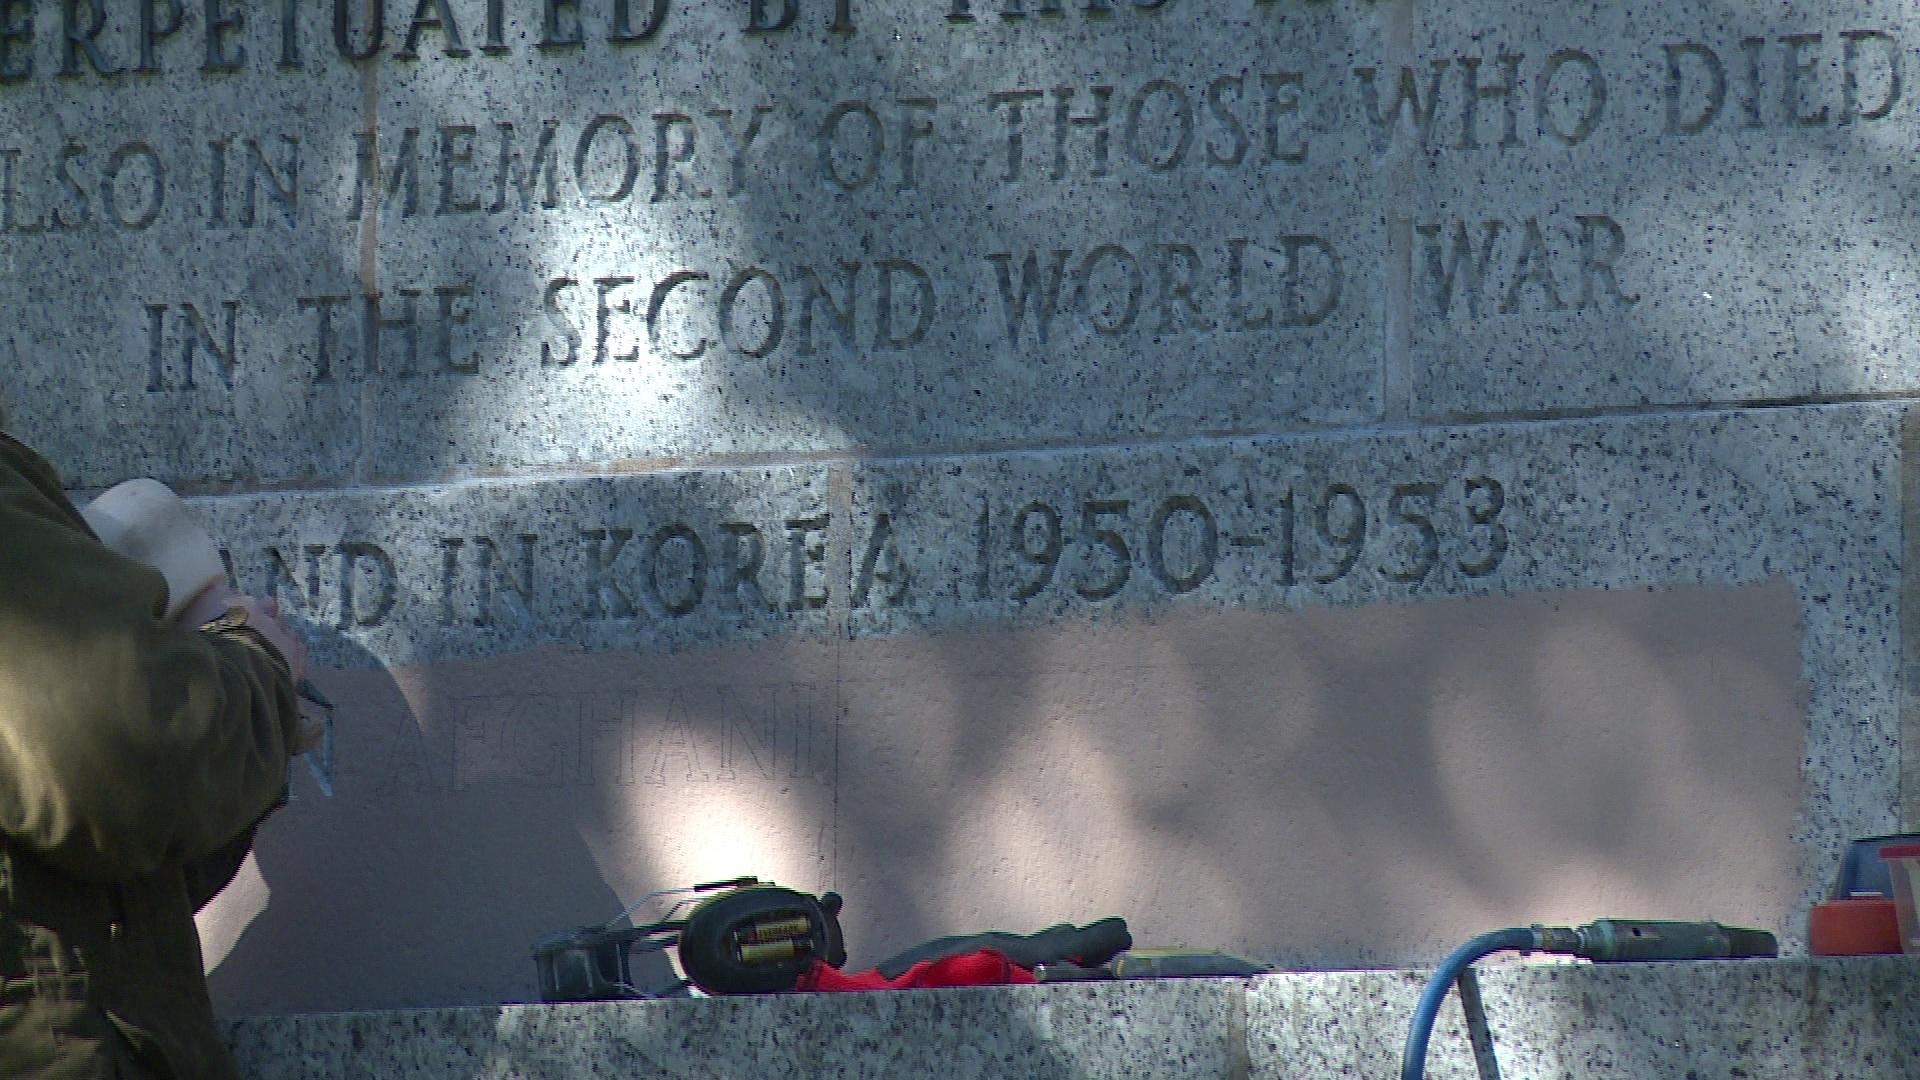 halifax cenotaph